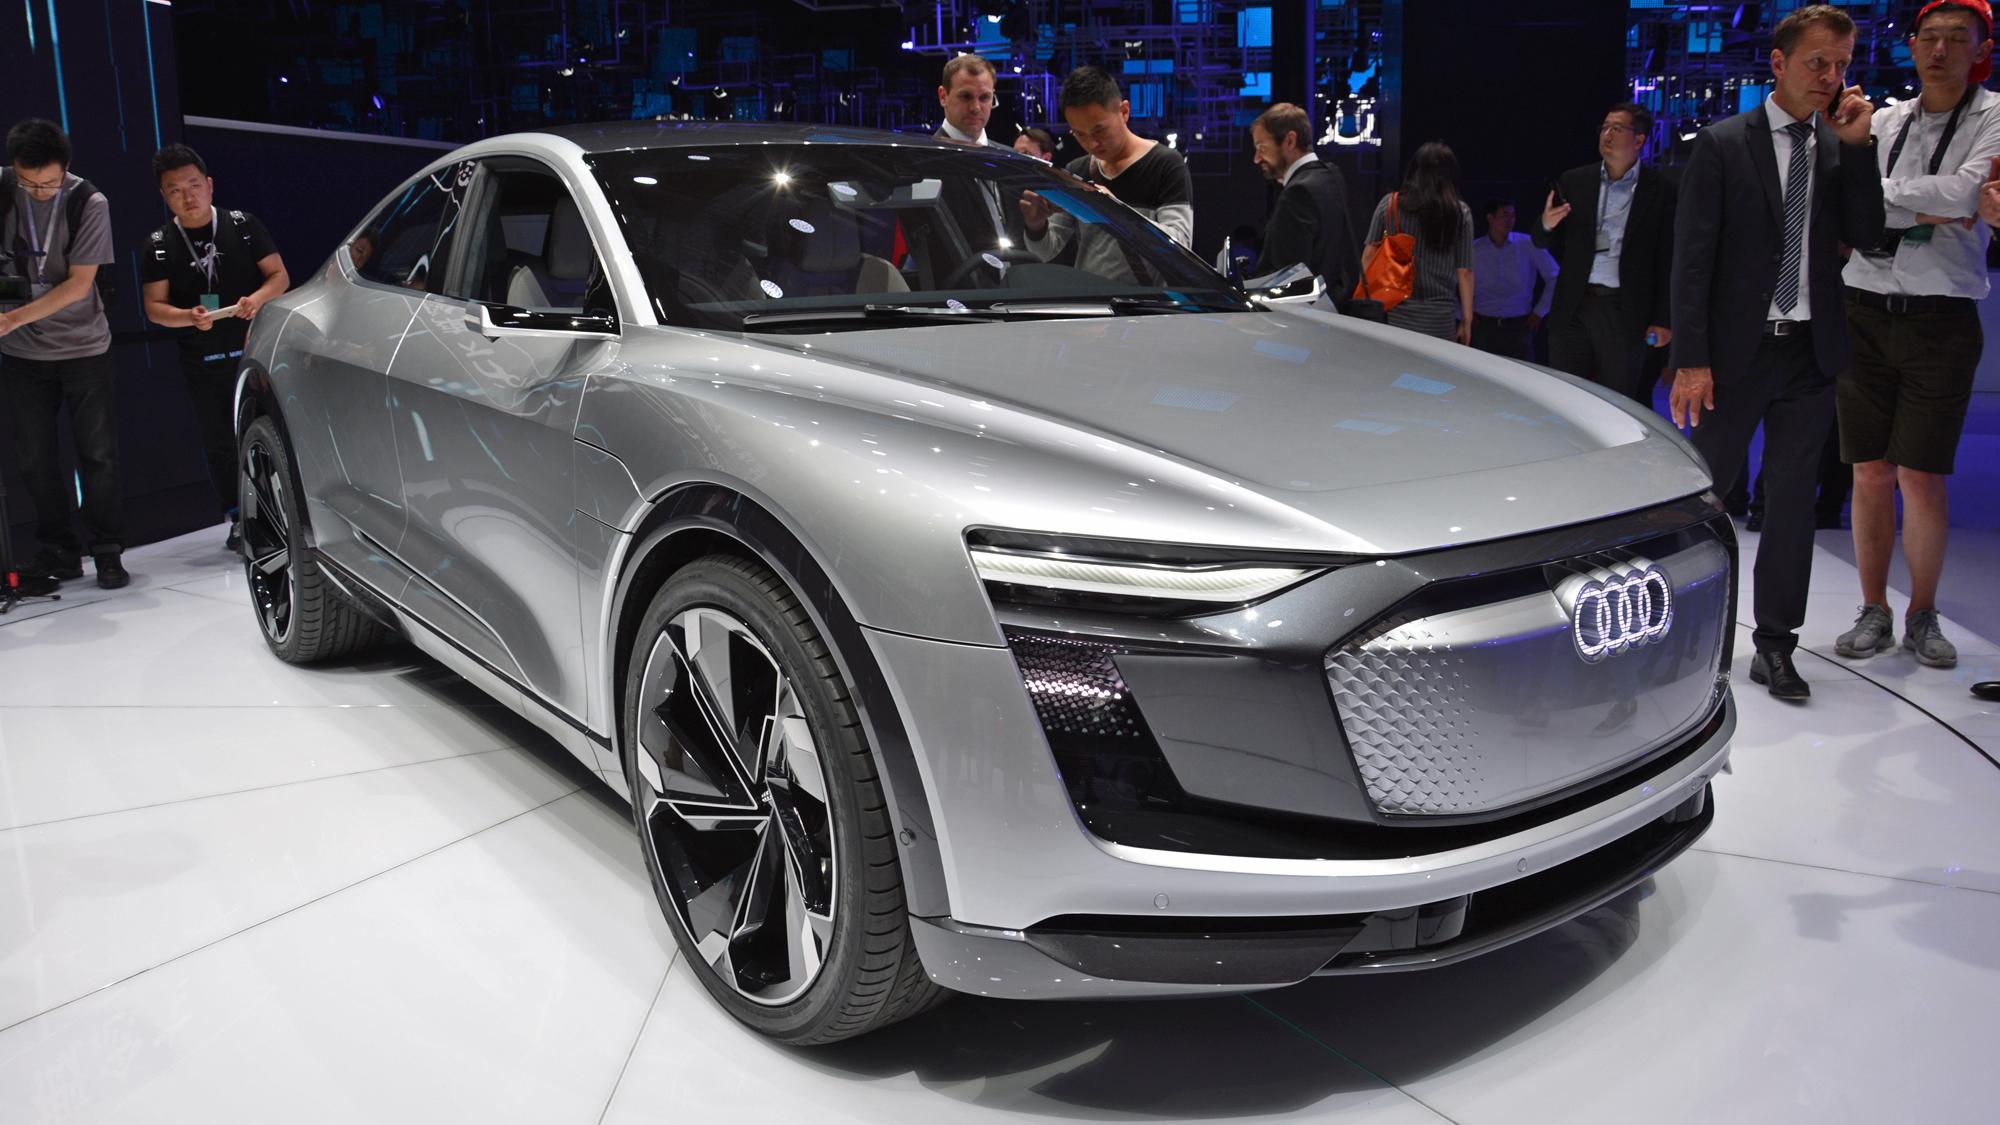 Audi e-tron Sportback Concept, 2017 Shanghai auto show    [photo:Ronan Glon]